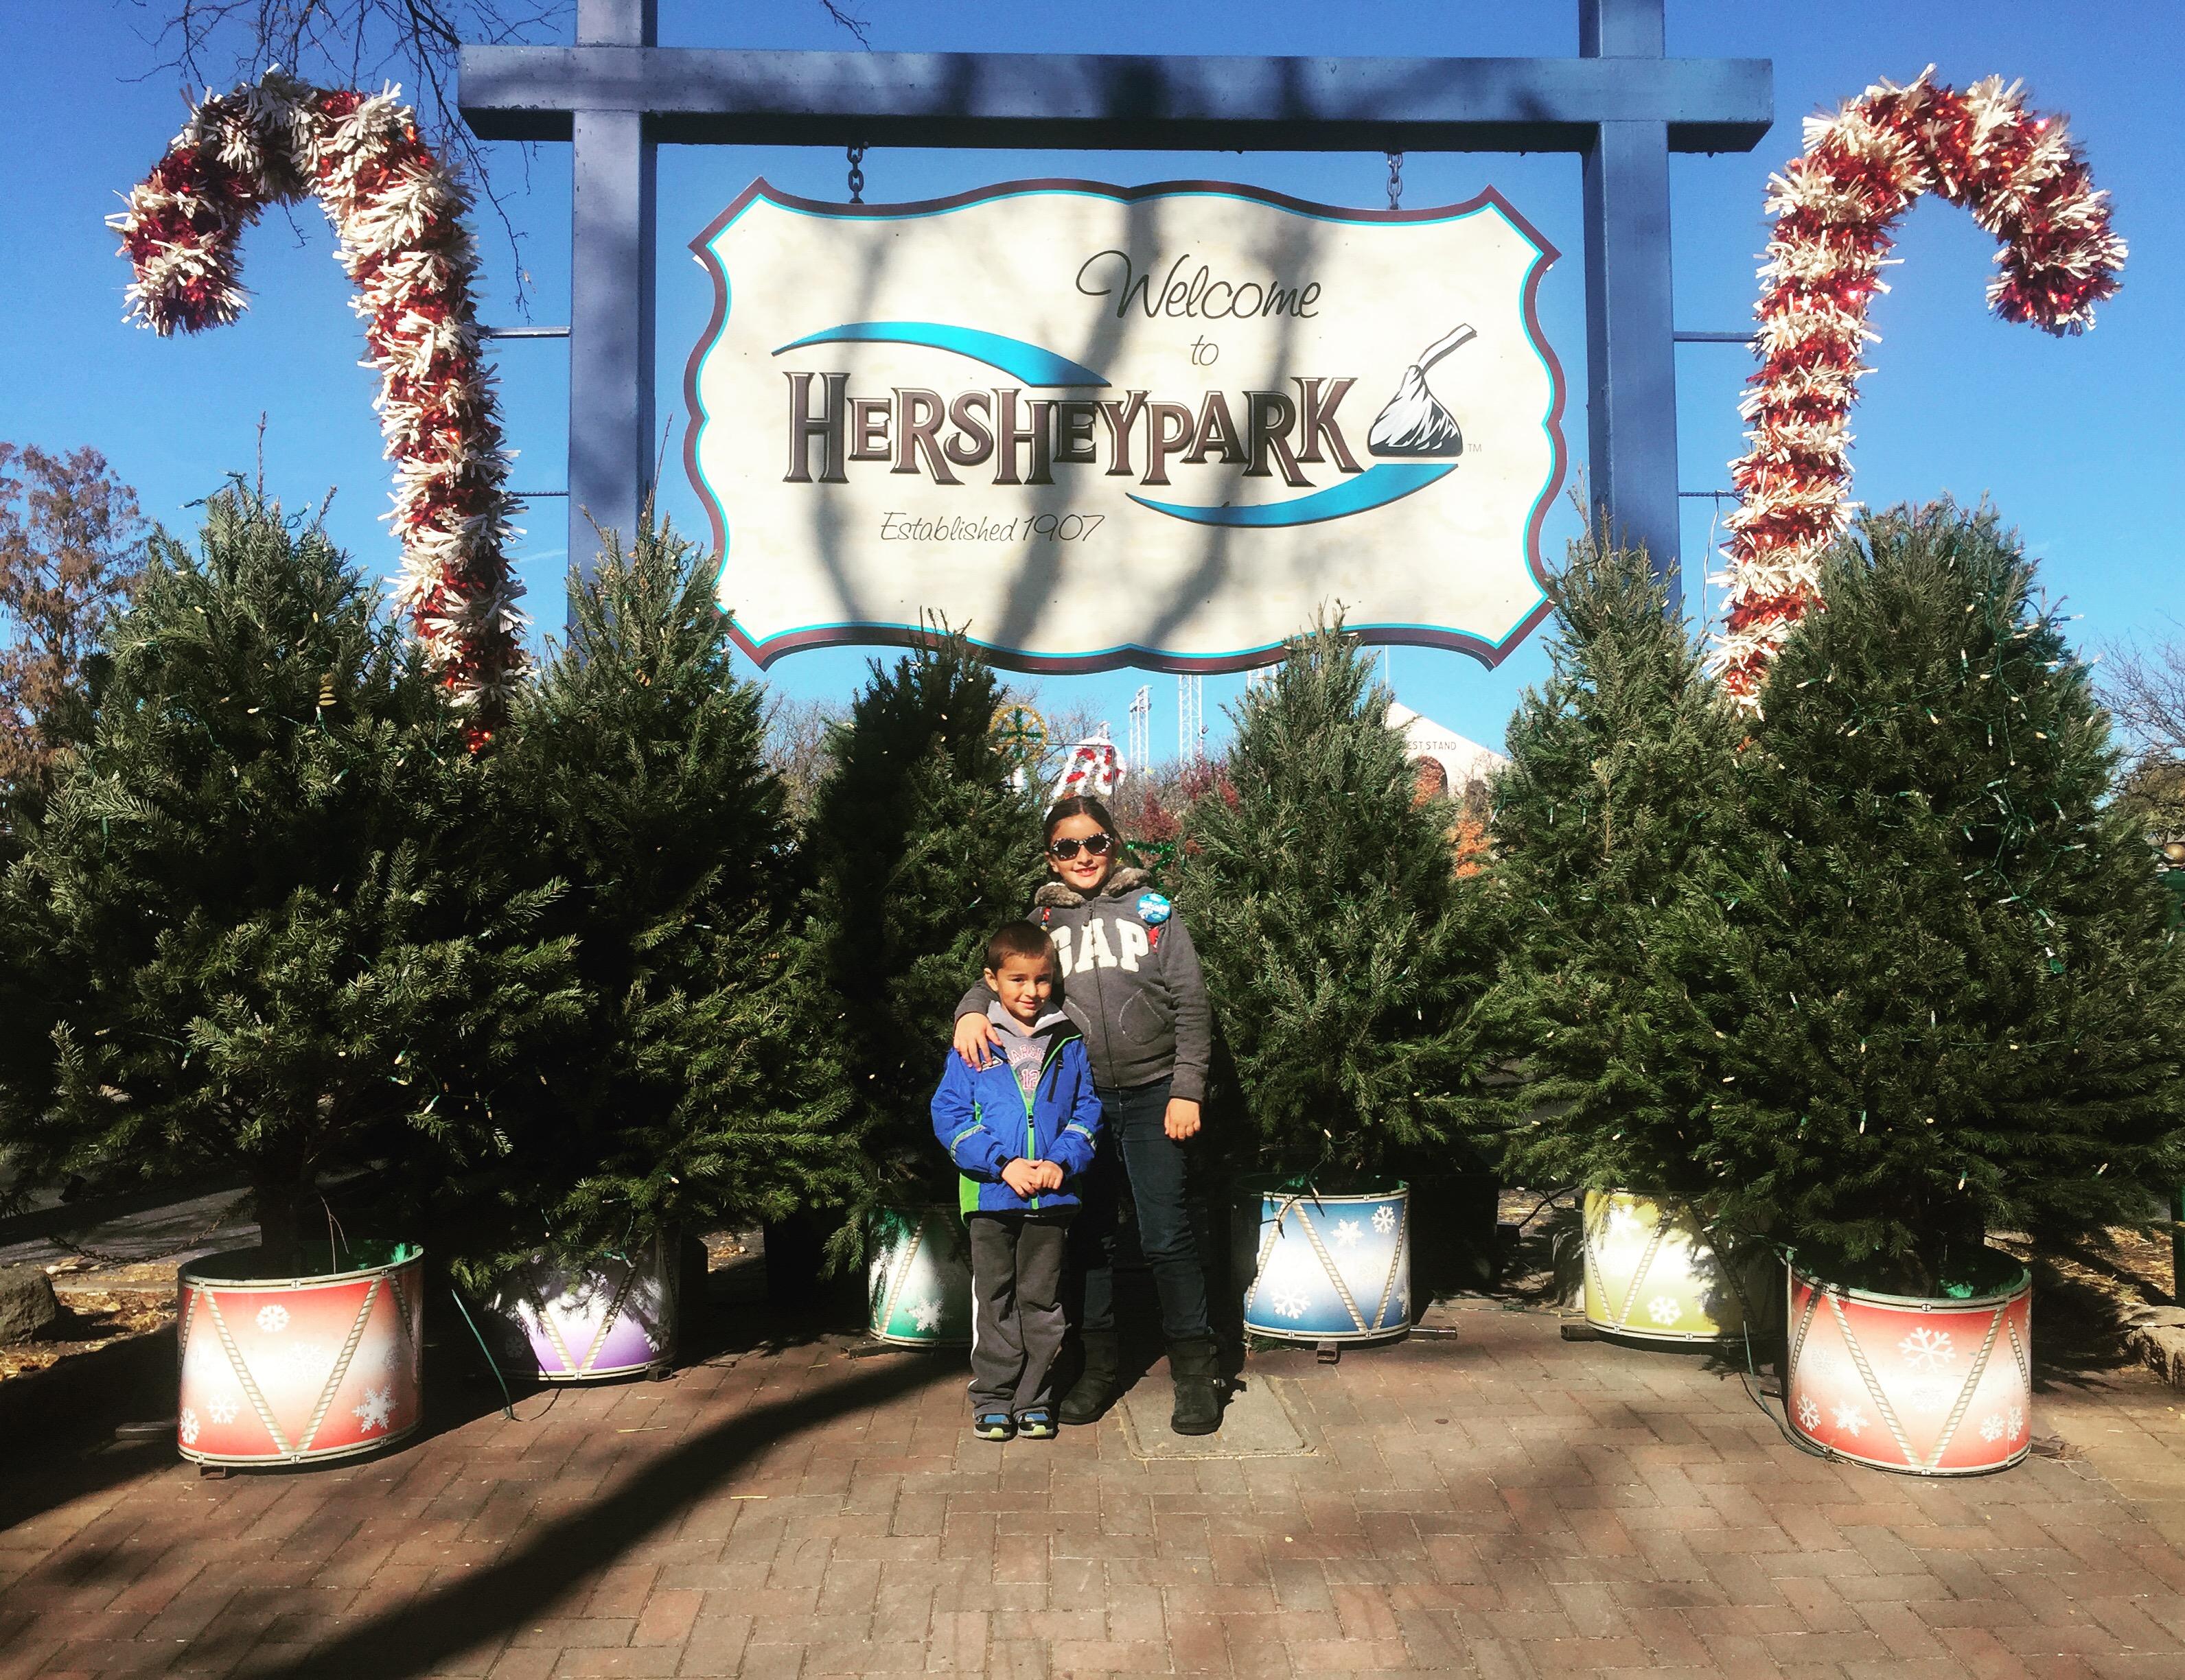 Hershey Park Christmas.Christmas At Hershey Candylane At Hershey Park